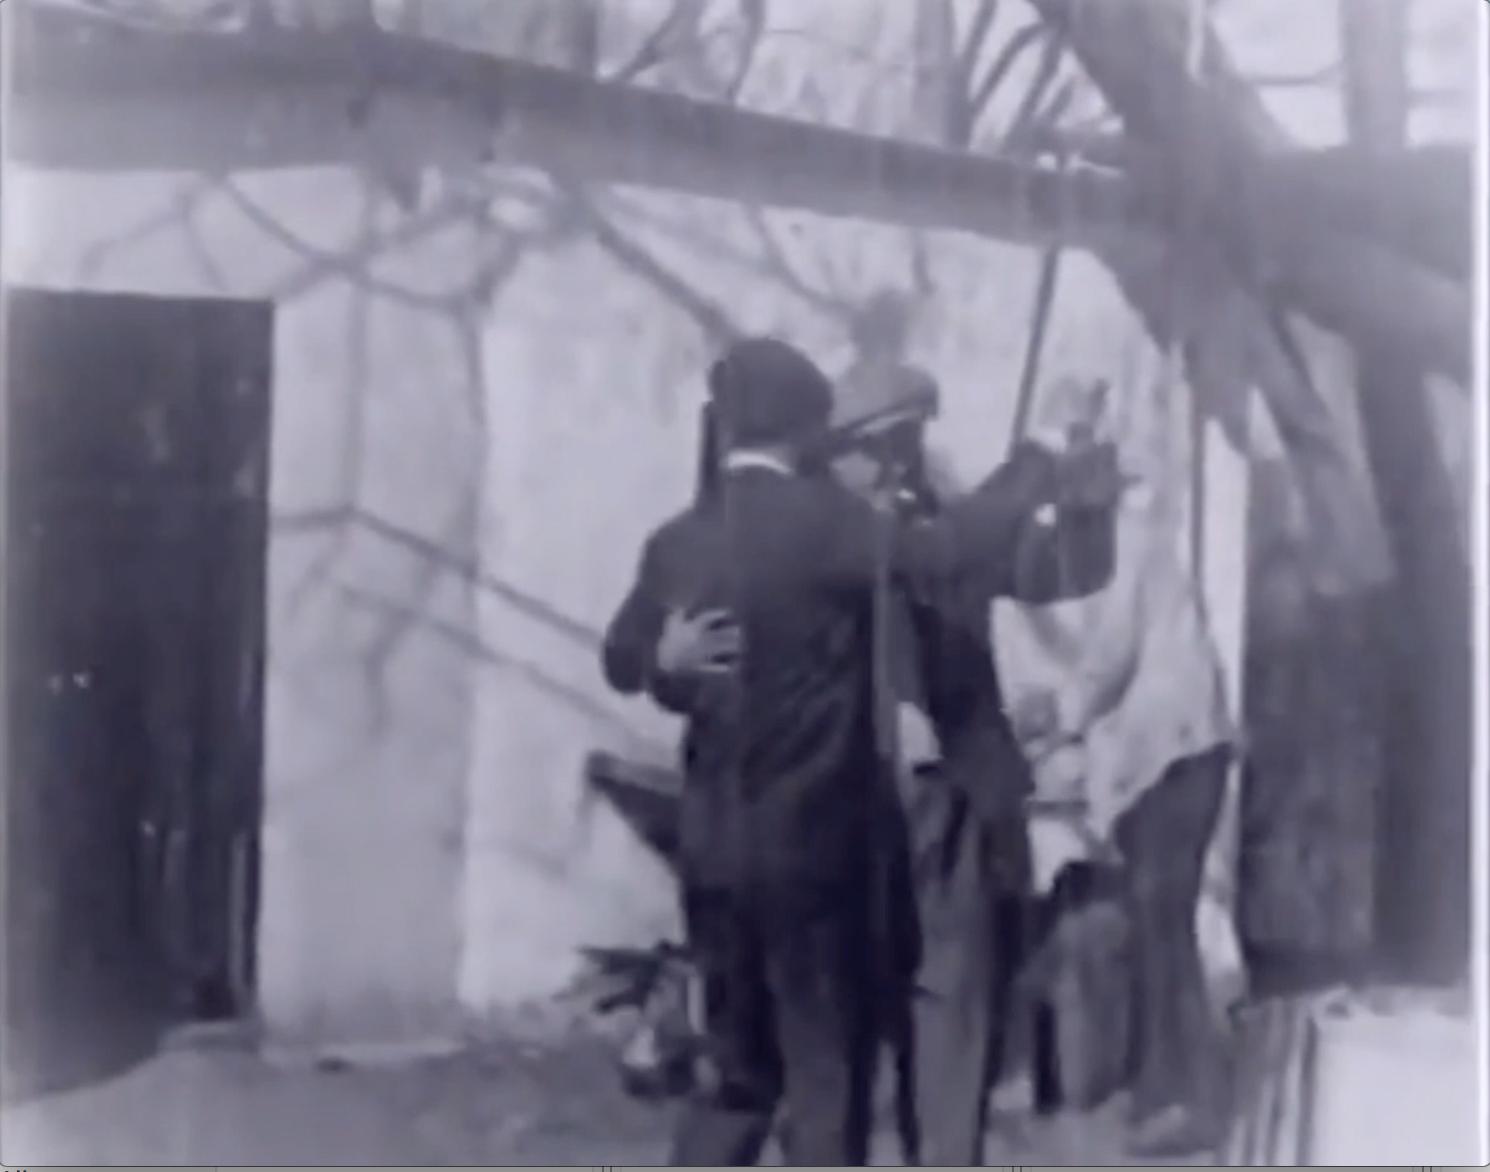 Film clip: Men Dancing Tango Together, Uruguay, 1928